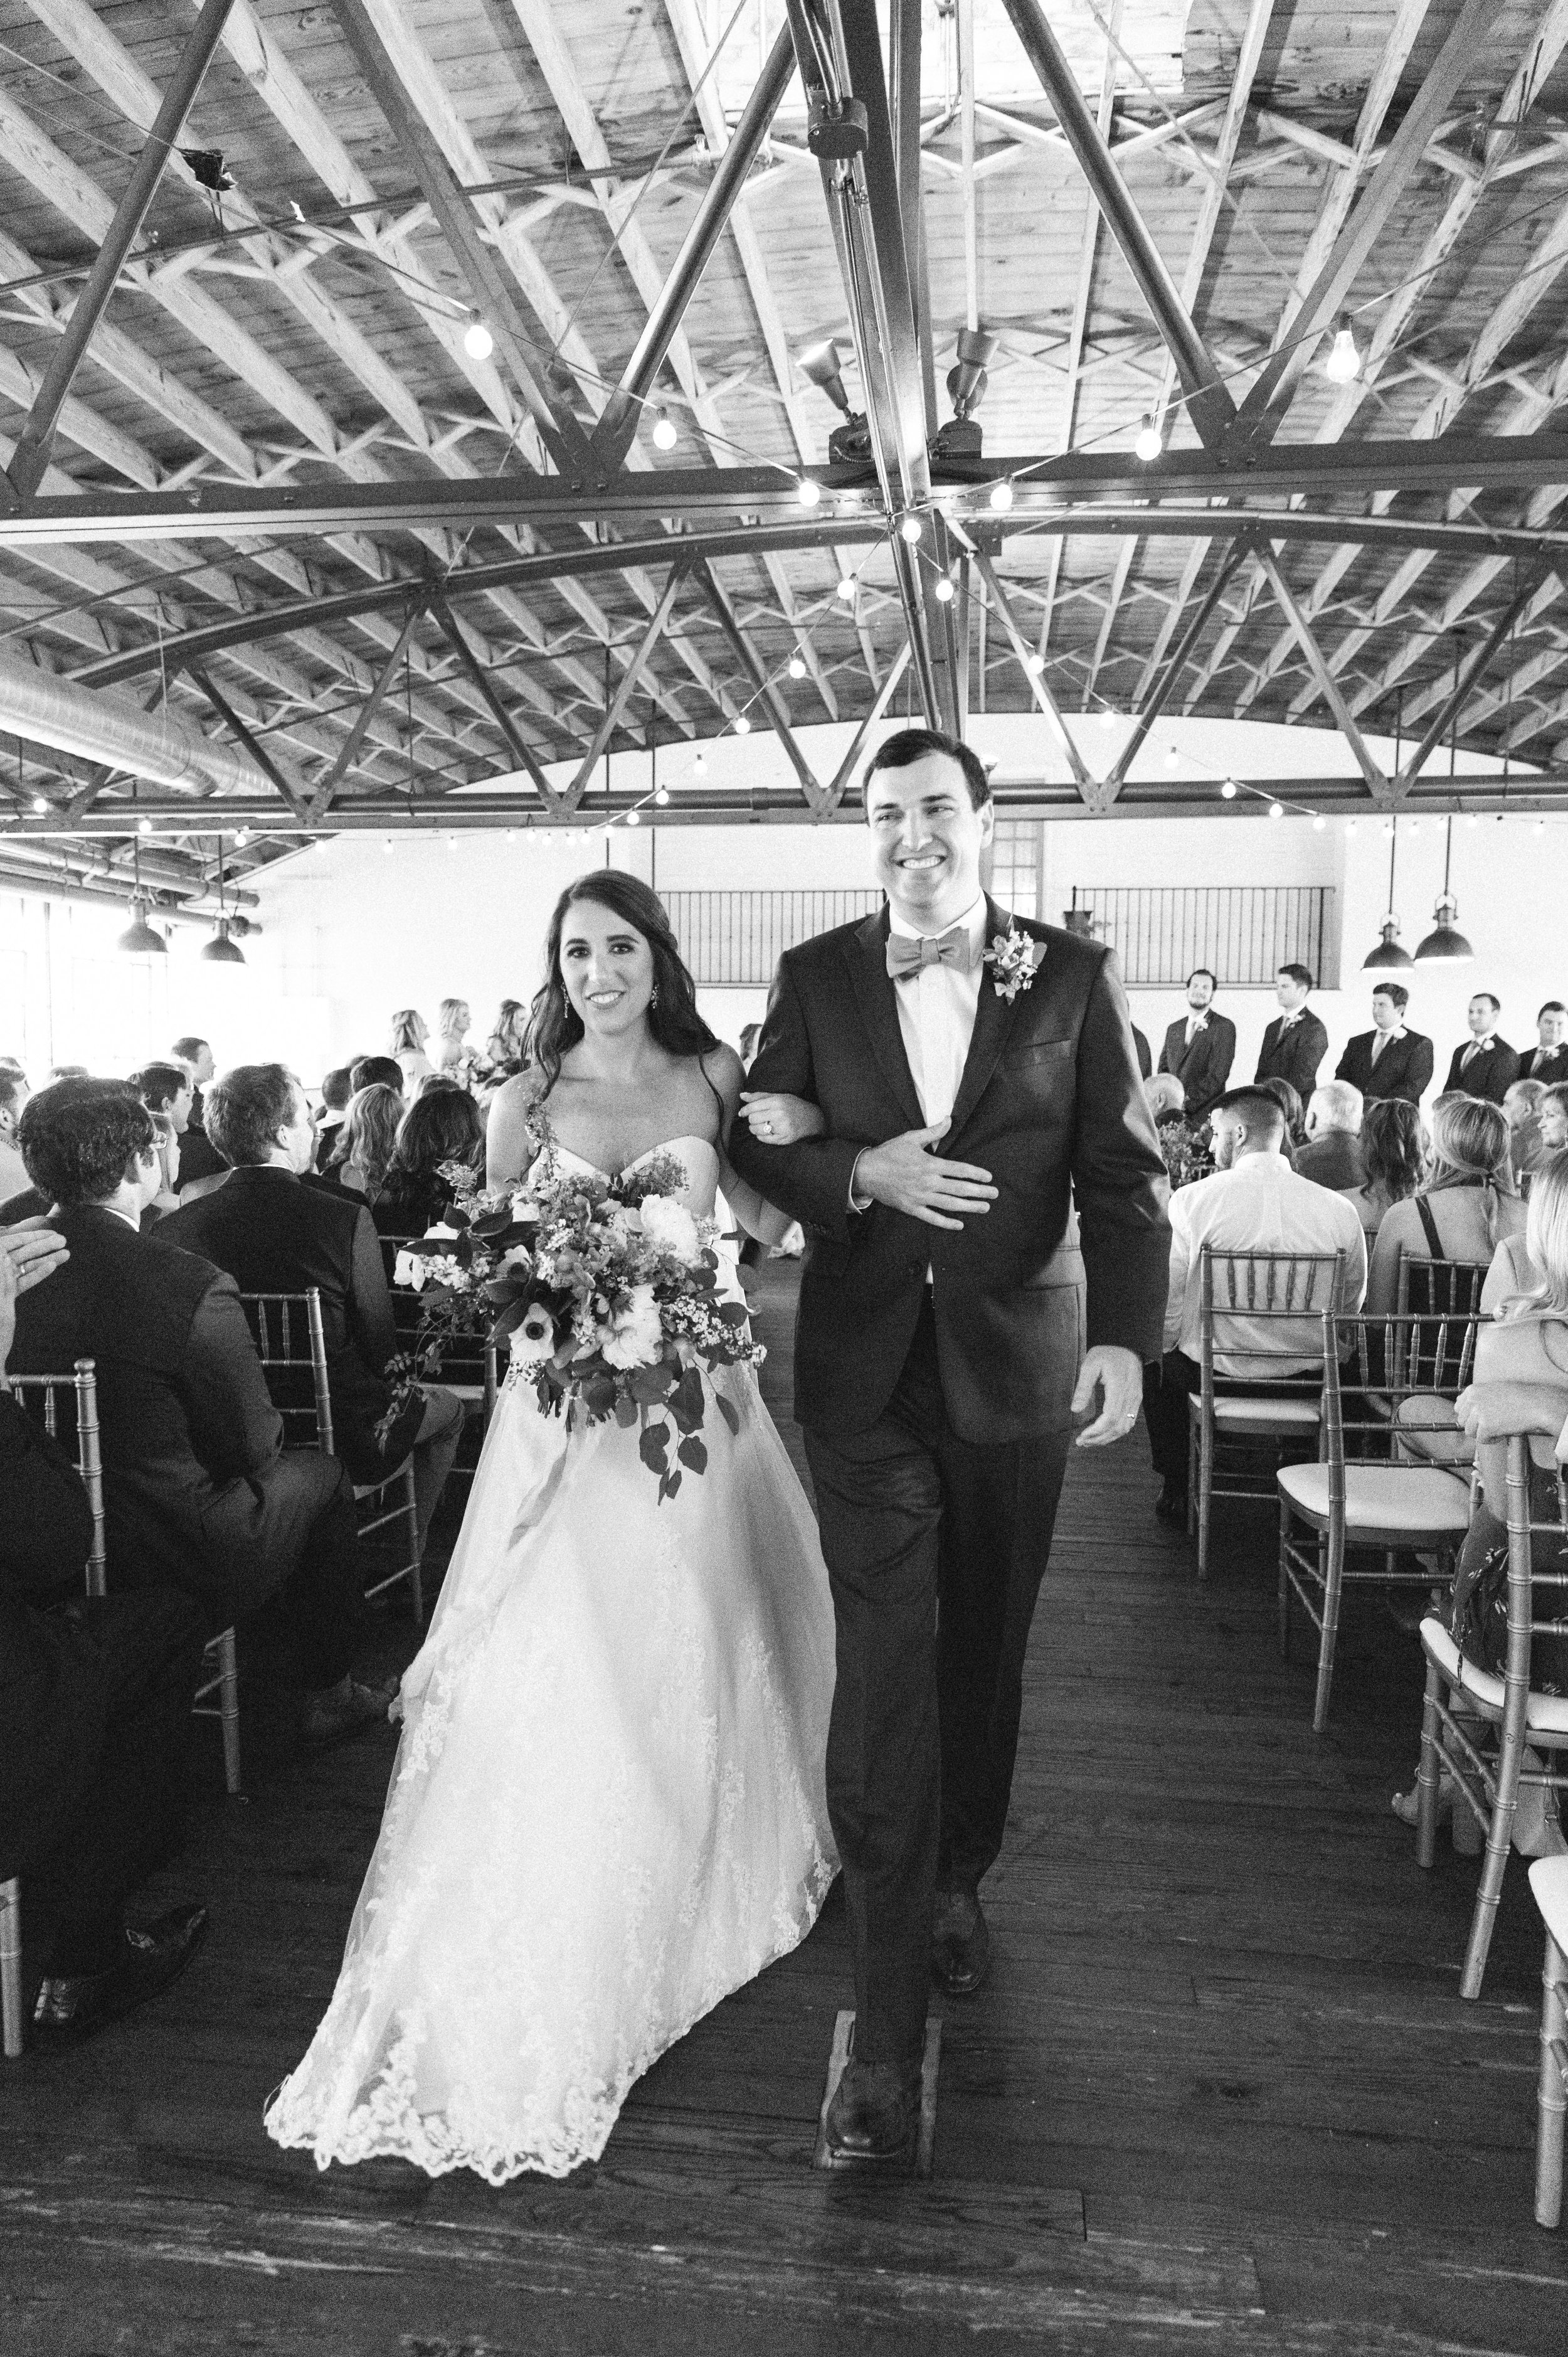 Romantic-Summerour-studio-wedding-hannah-forsberg-atlanta-wedding-photographer50.JPG